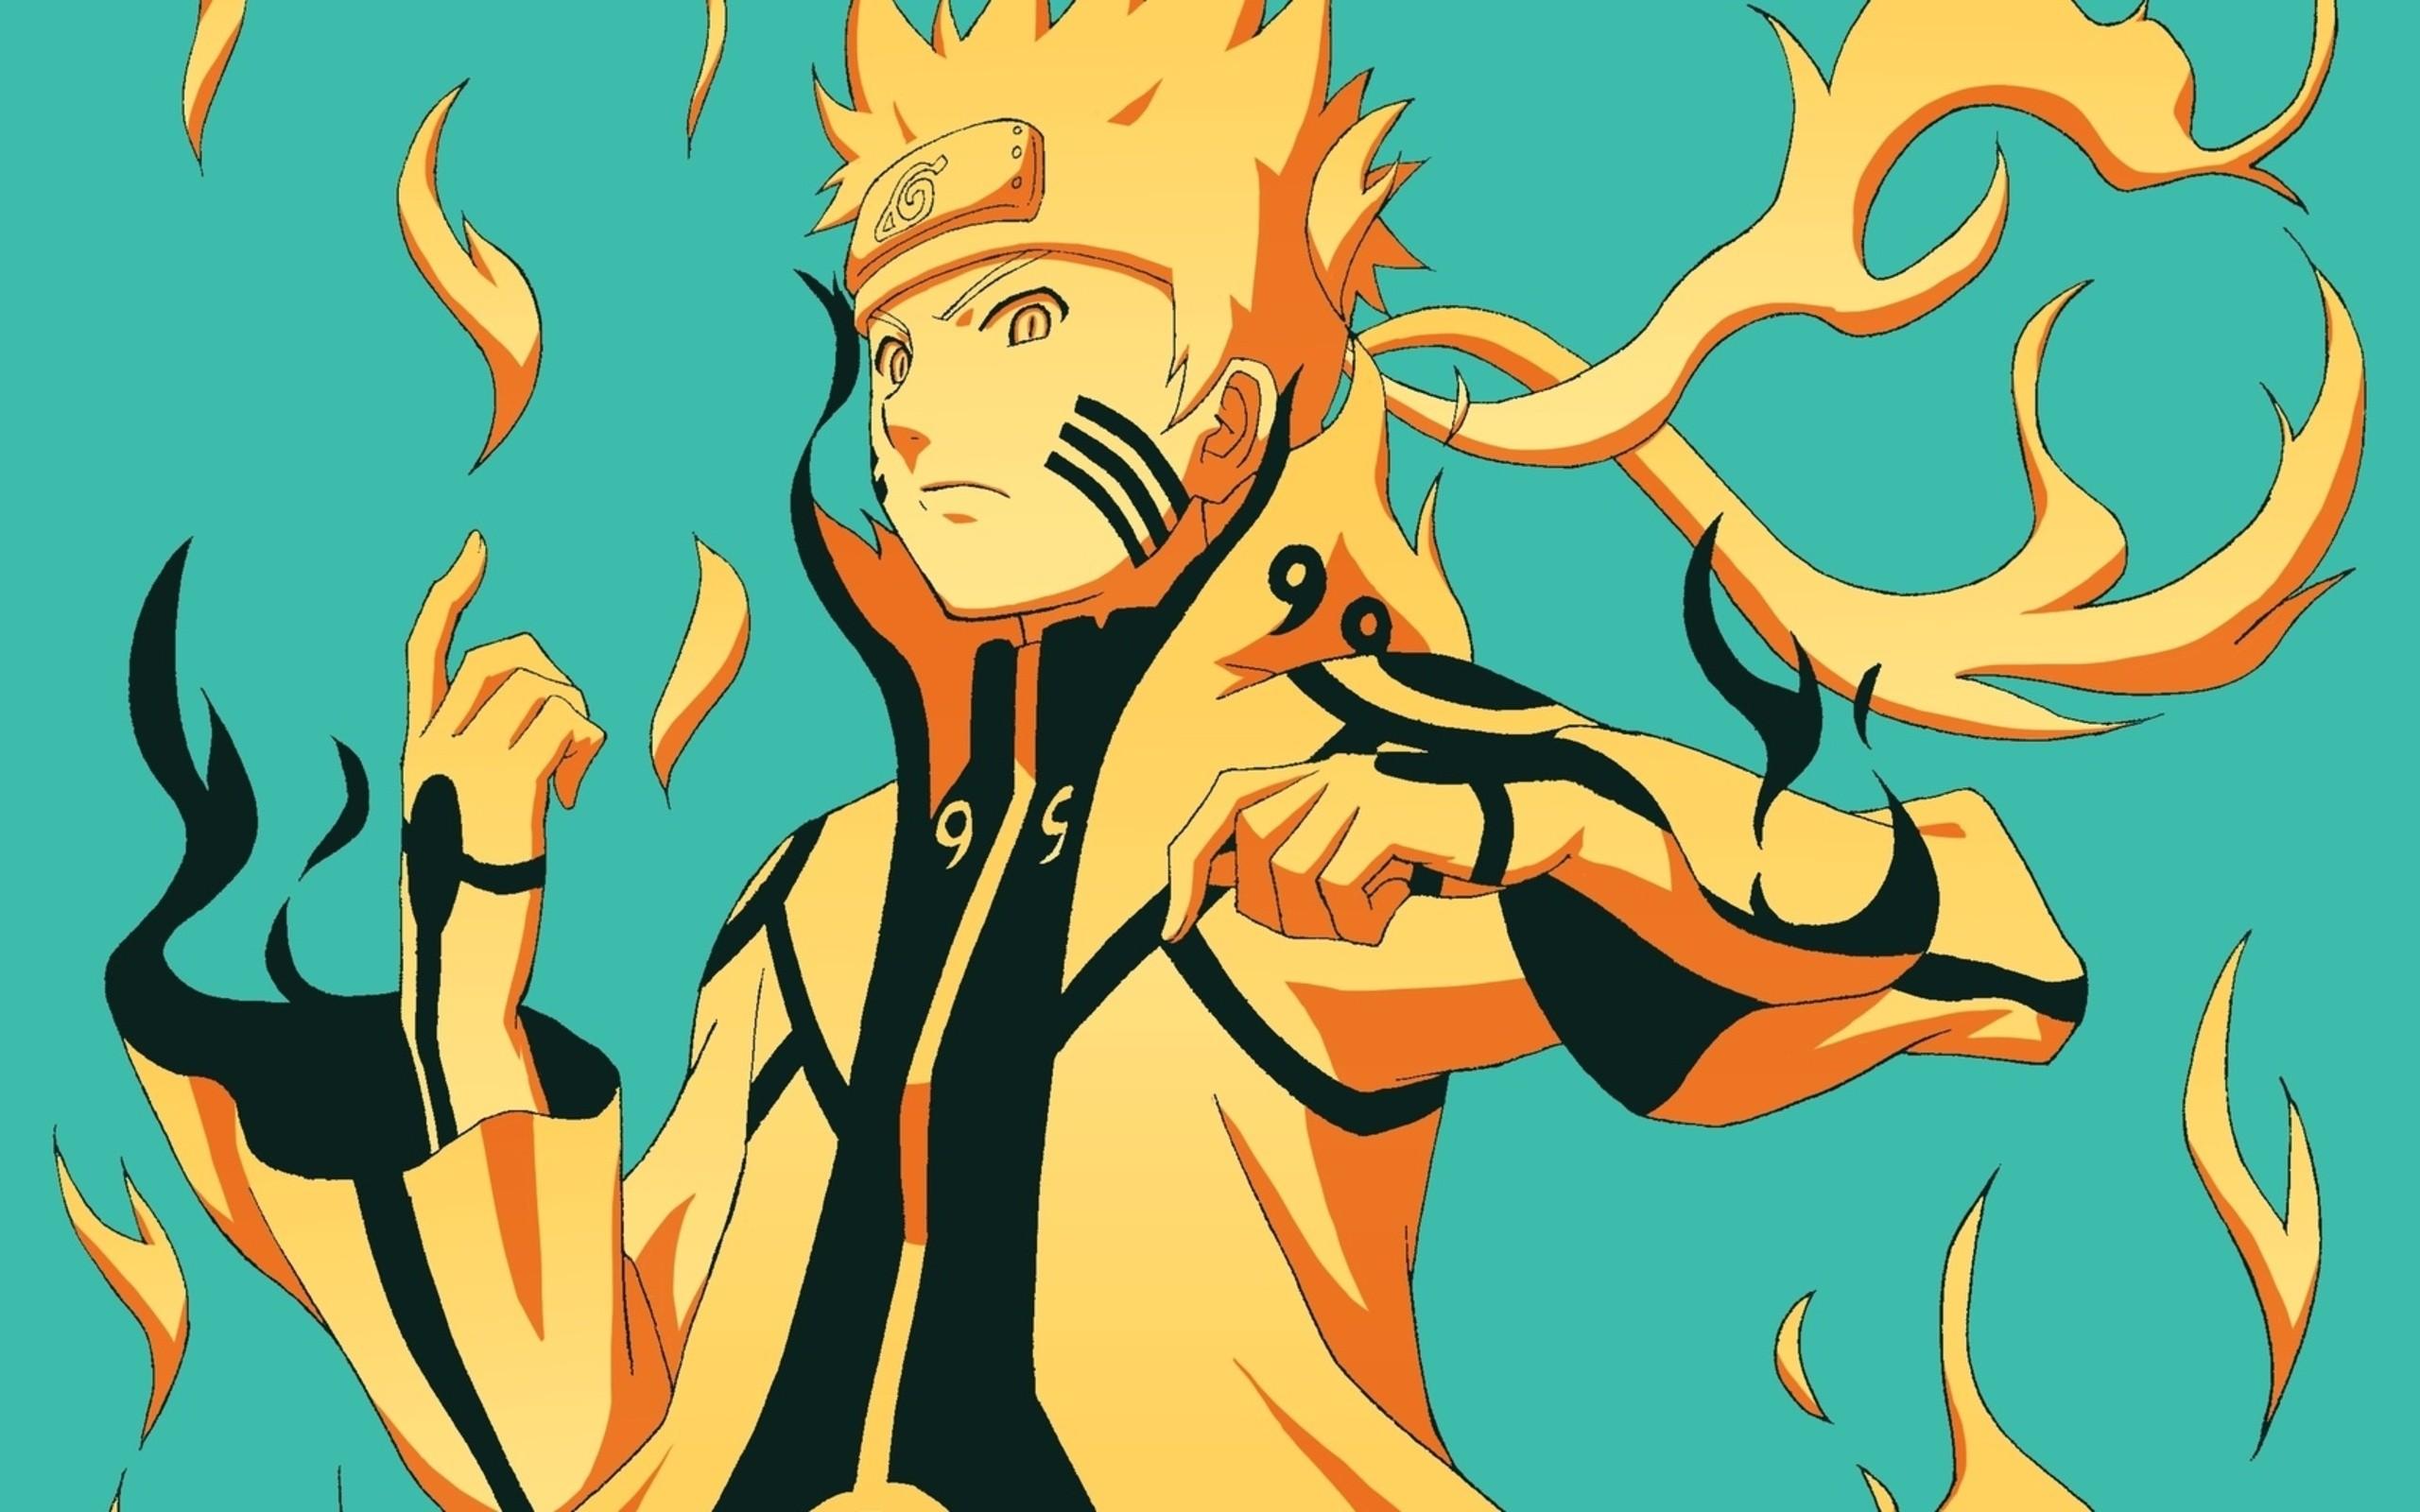 Download Wallpaper Naruto Yellow - naruto-shippuden-wallpaper-28  Trends.jpg